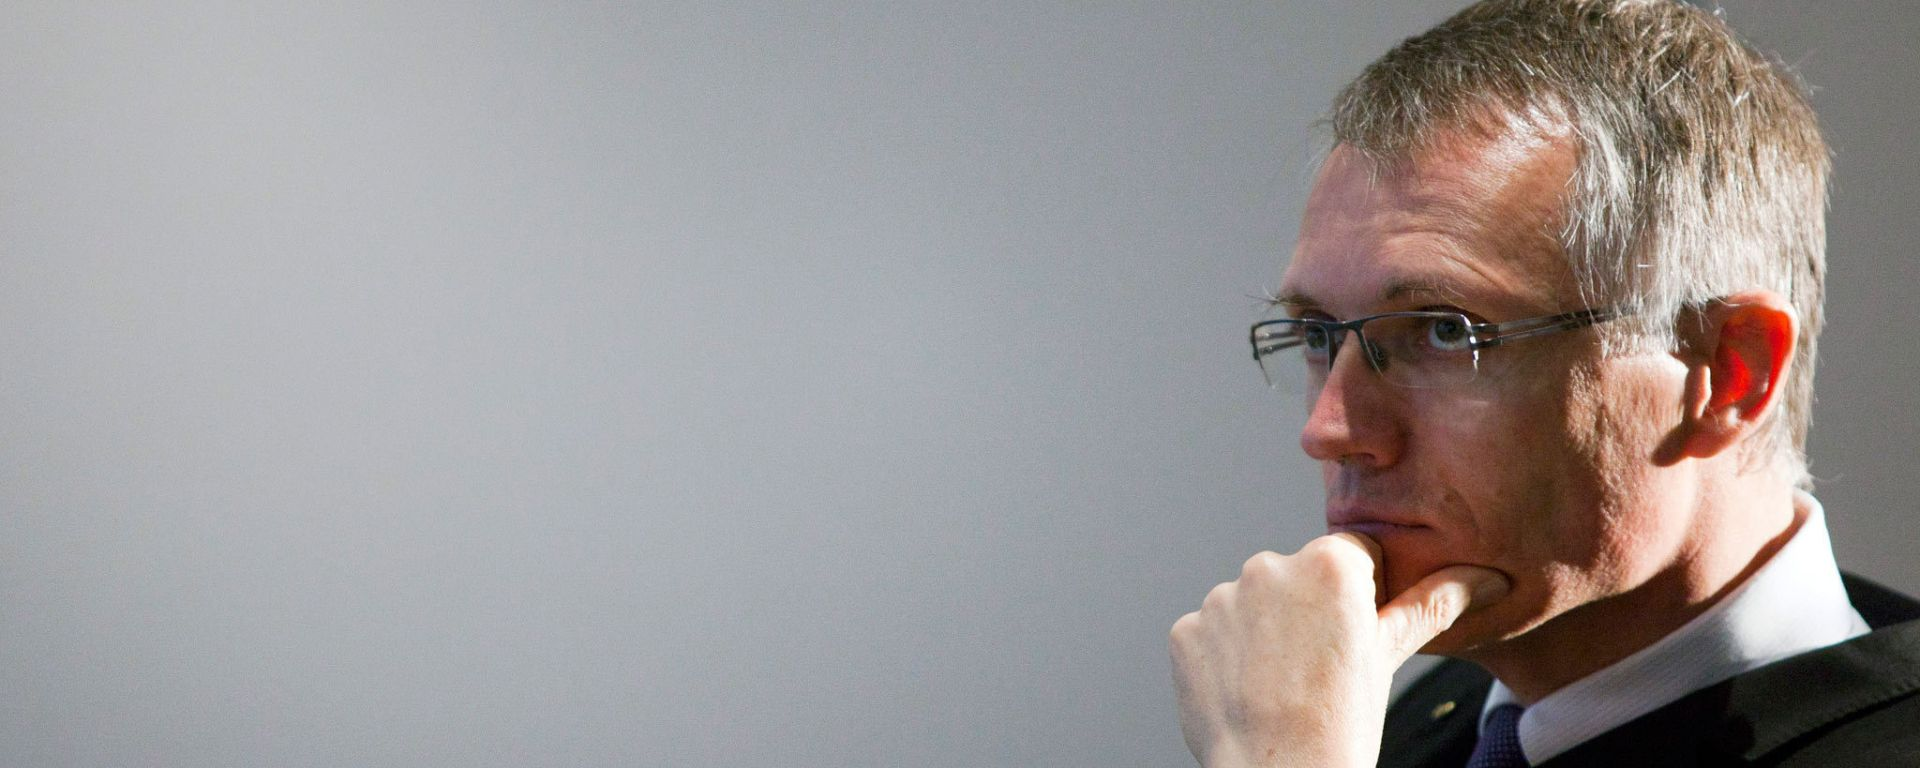 Fusione FCA-Renault, Carlos Tavares (PSA) è scettico